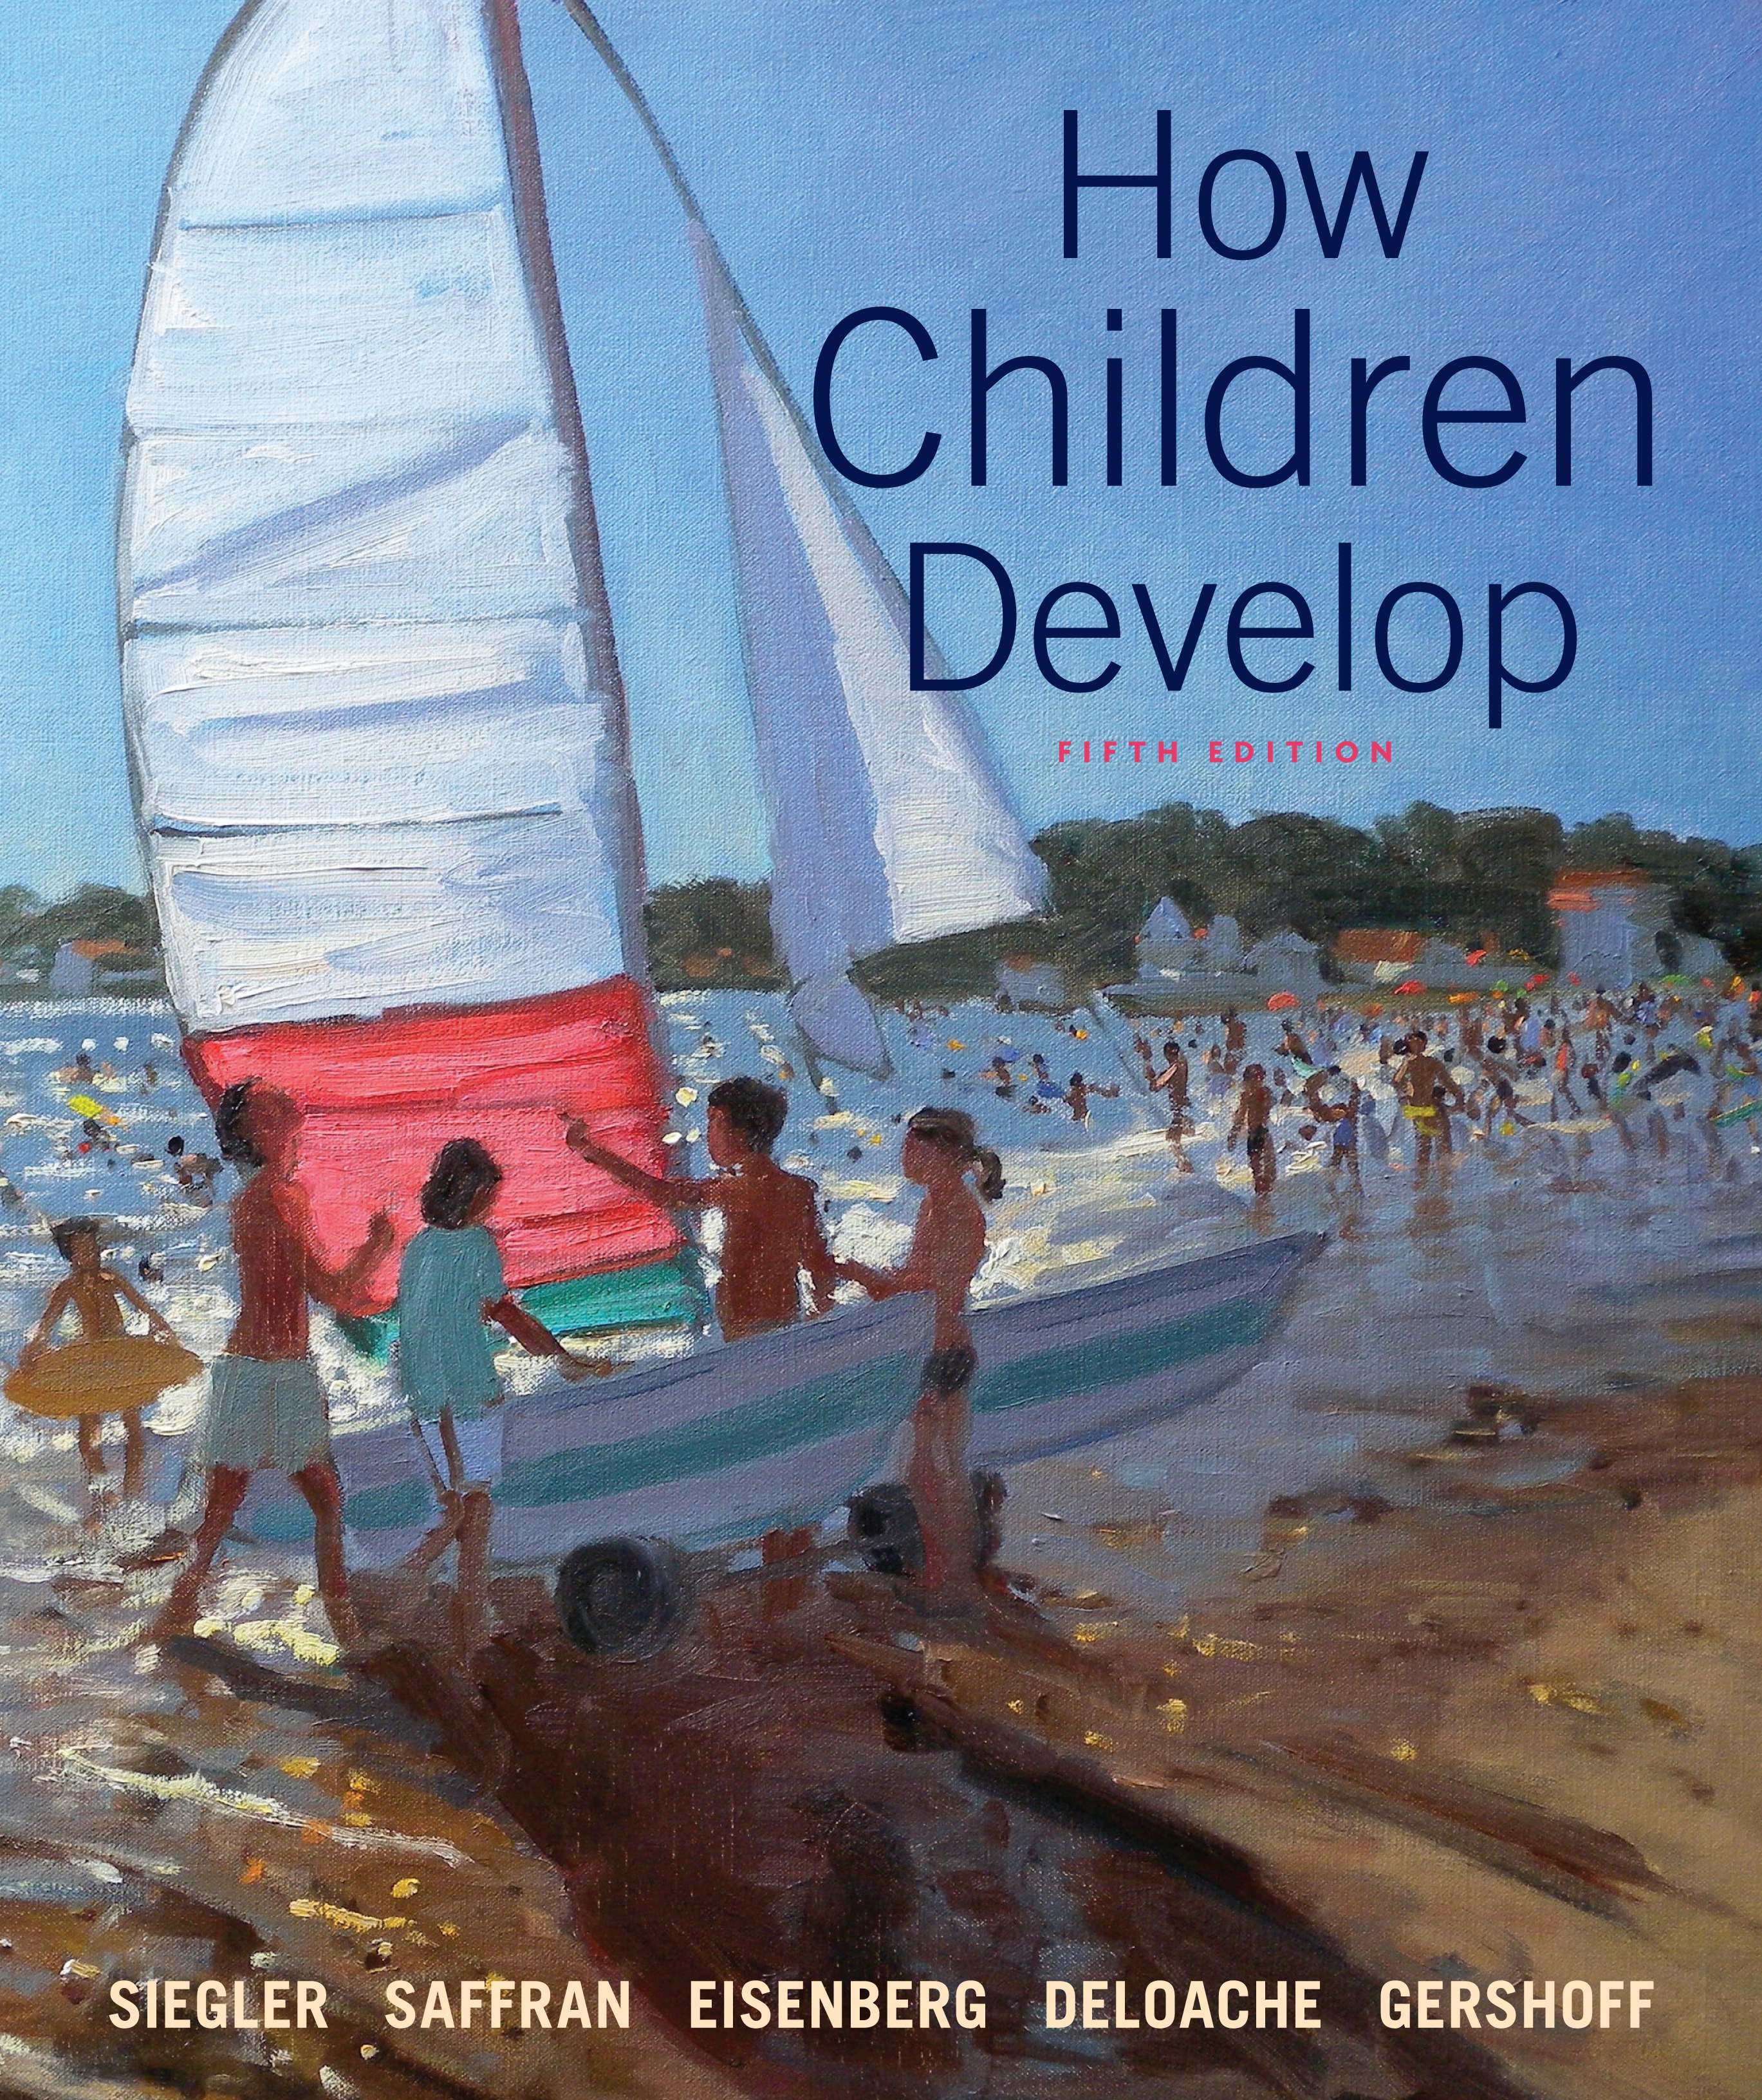 How children develop 9781319014230 macmillan learning download image how children develop fandeluxe Image collections